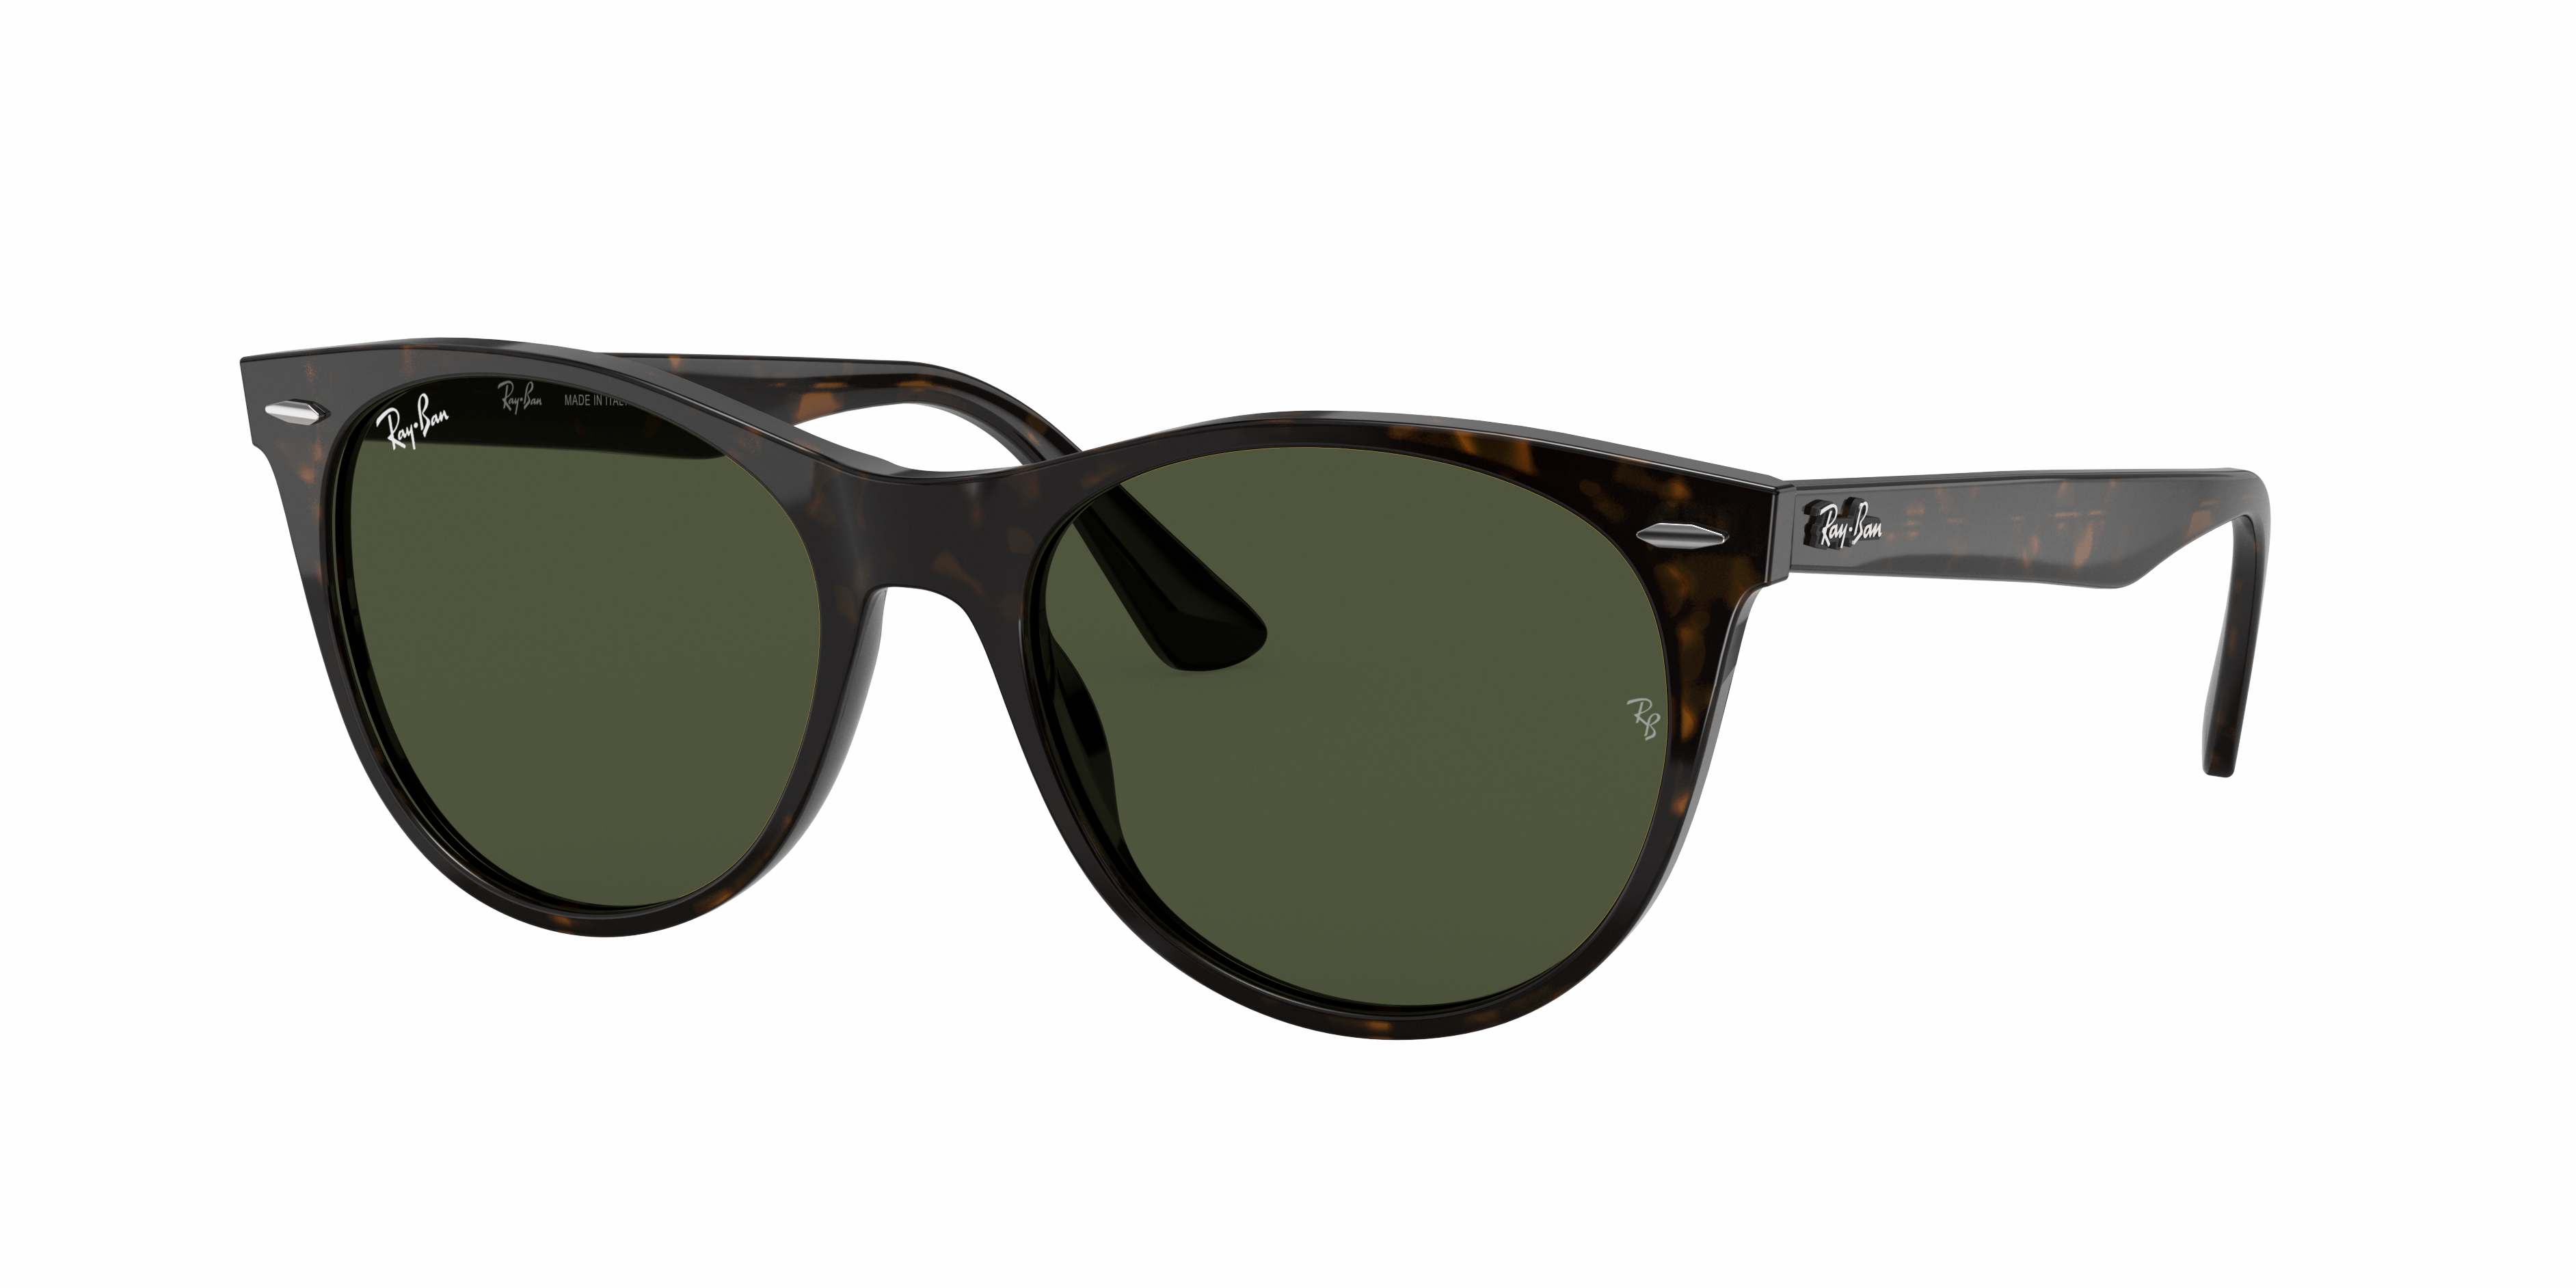 Ray-Ban Wayfarer II Classic Tortoise, Green Lenses - RB2185